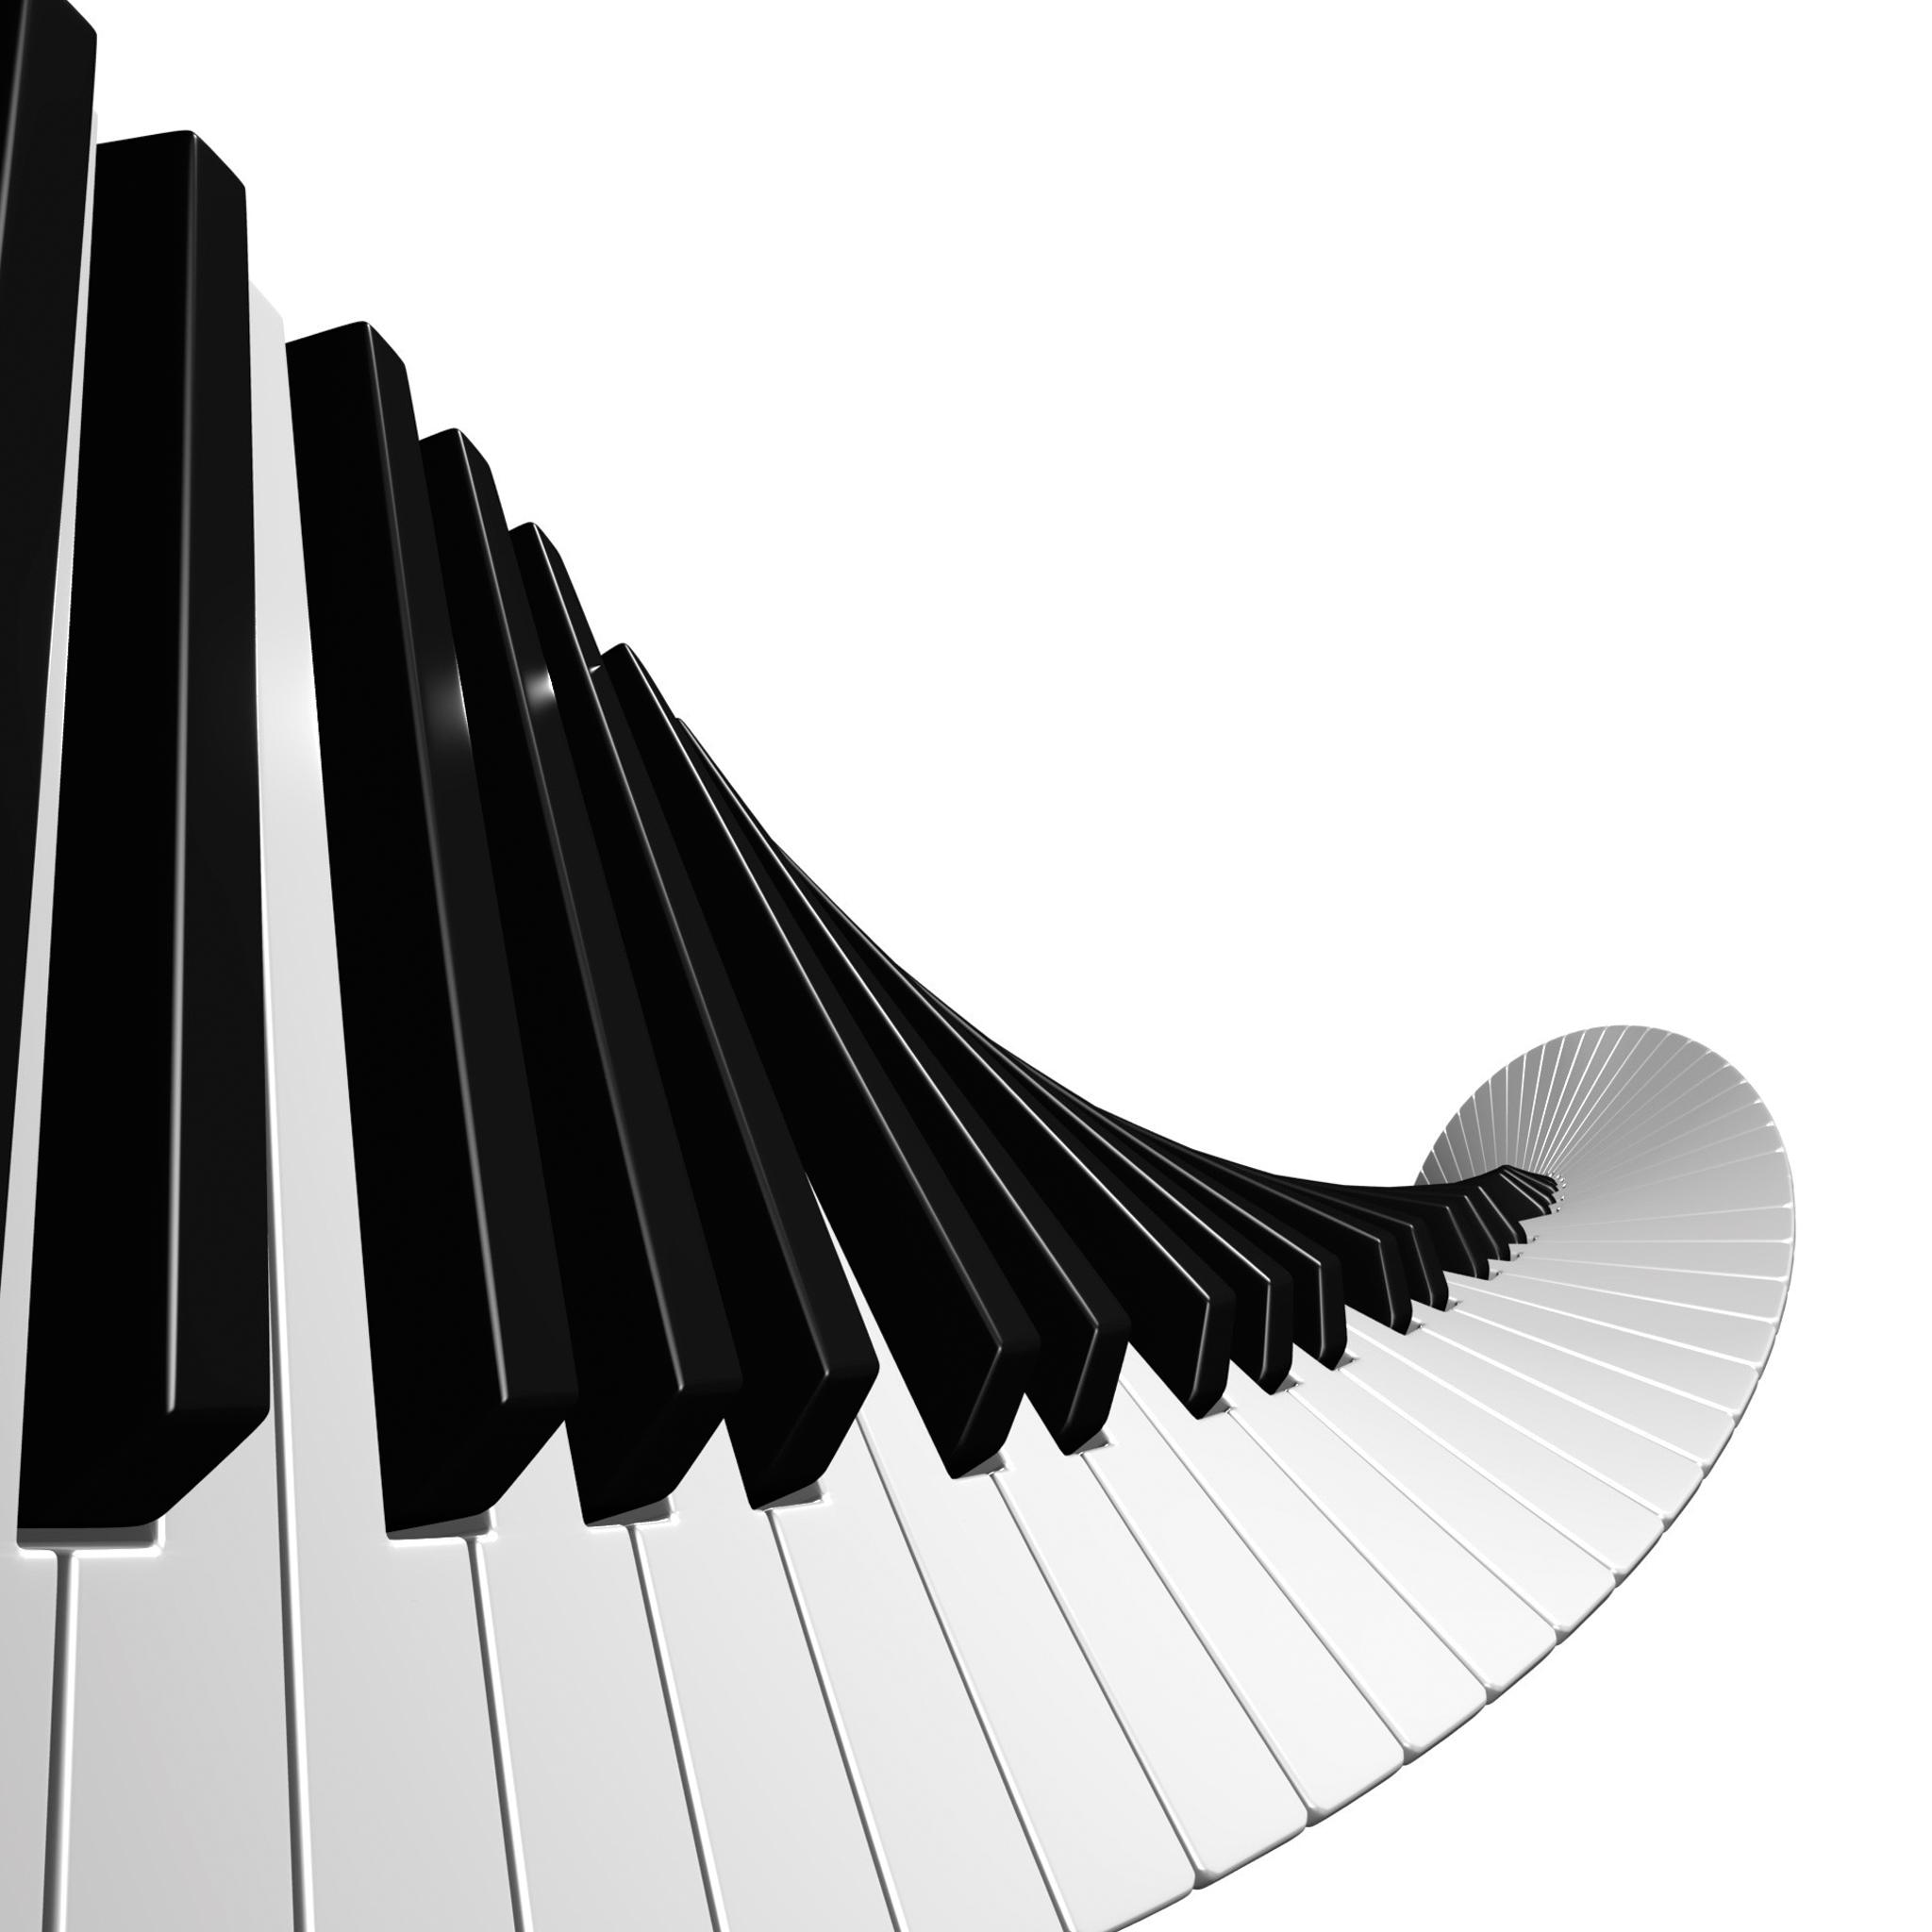 Piano-3Wallpapers-iPad